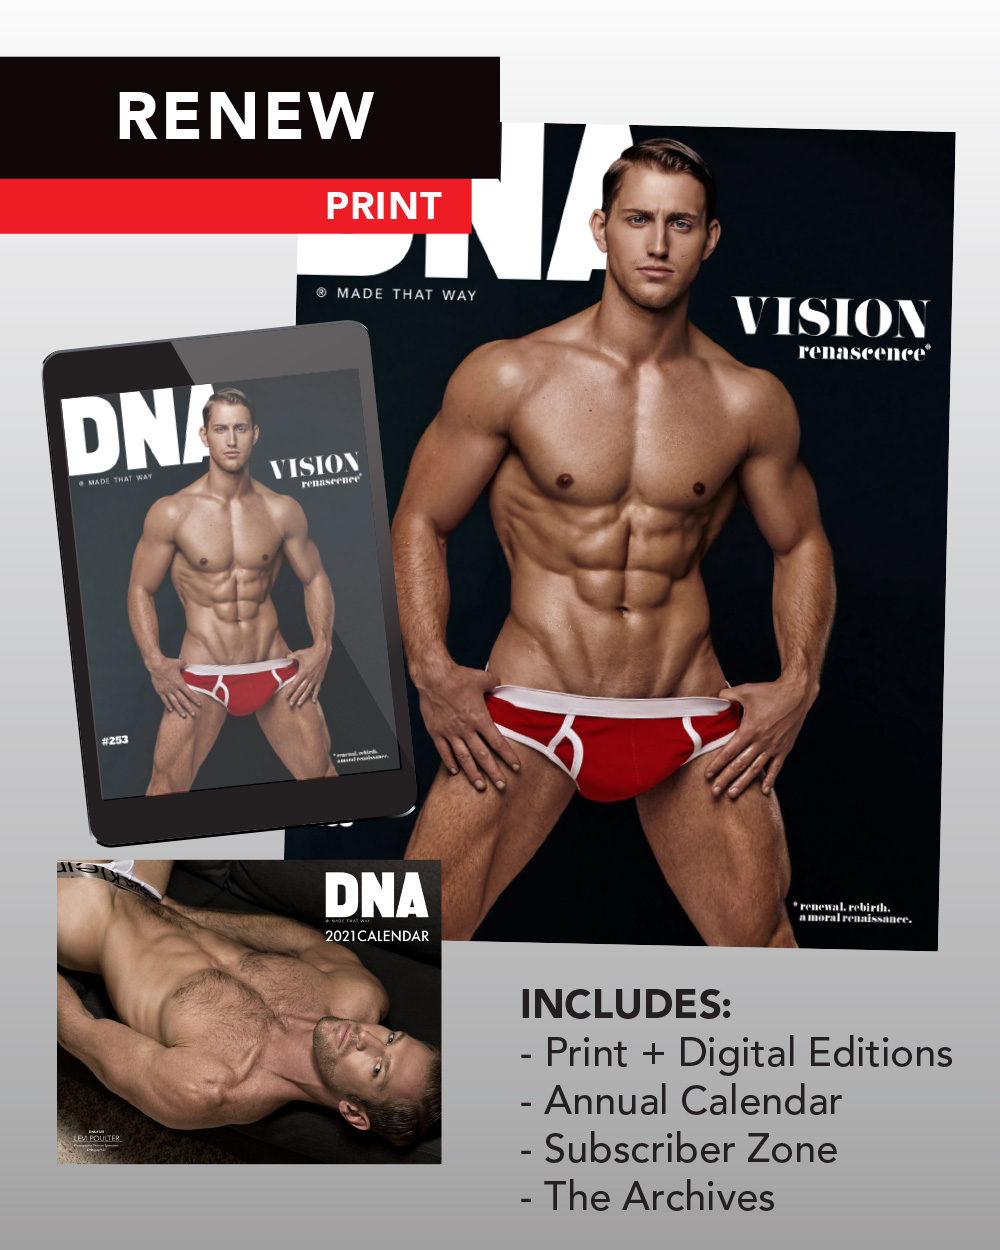 253_Renew-Print-Feature